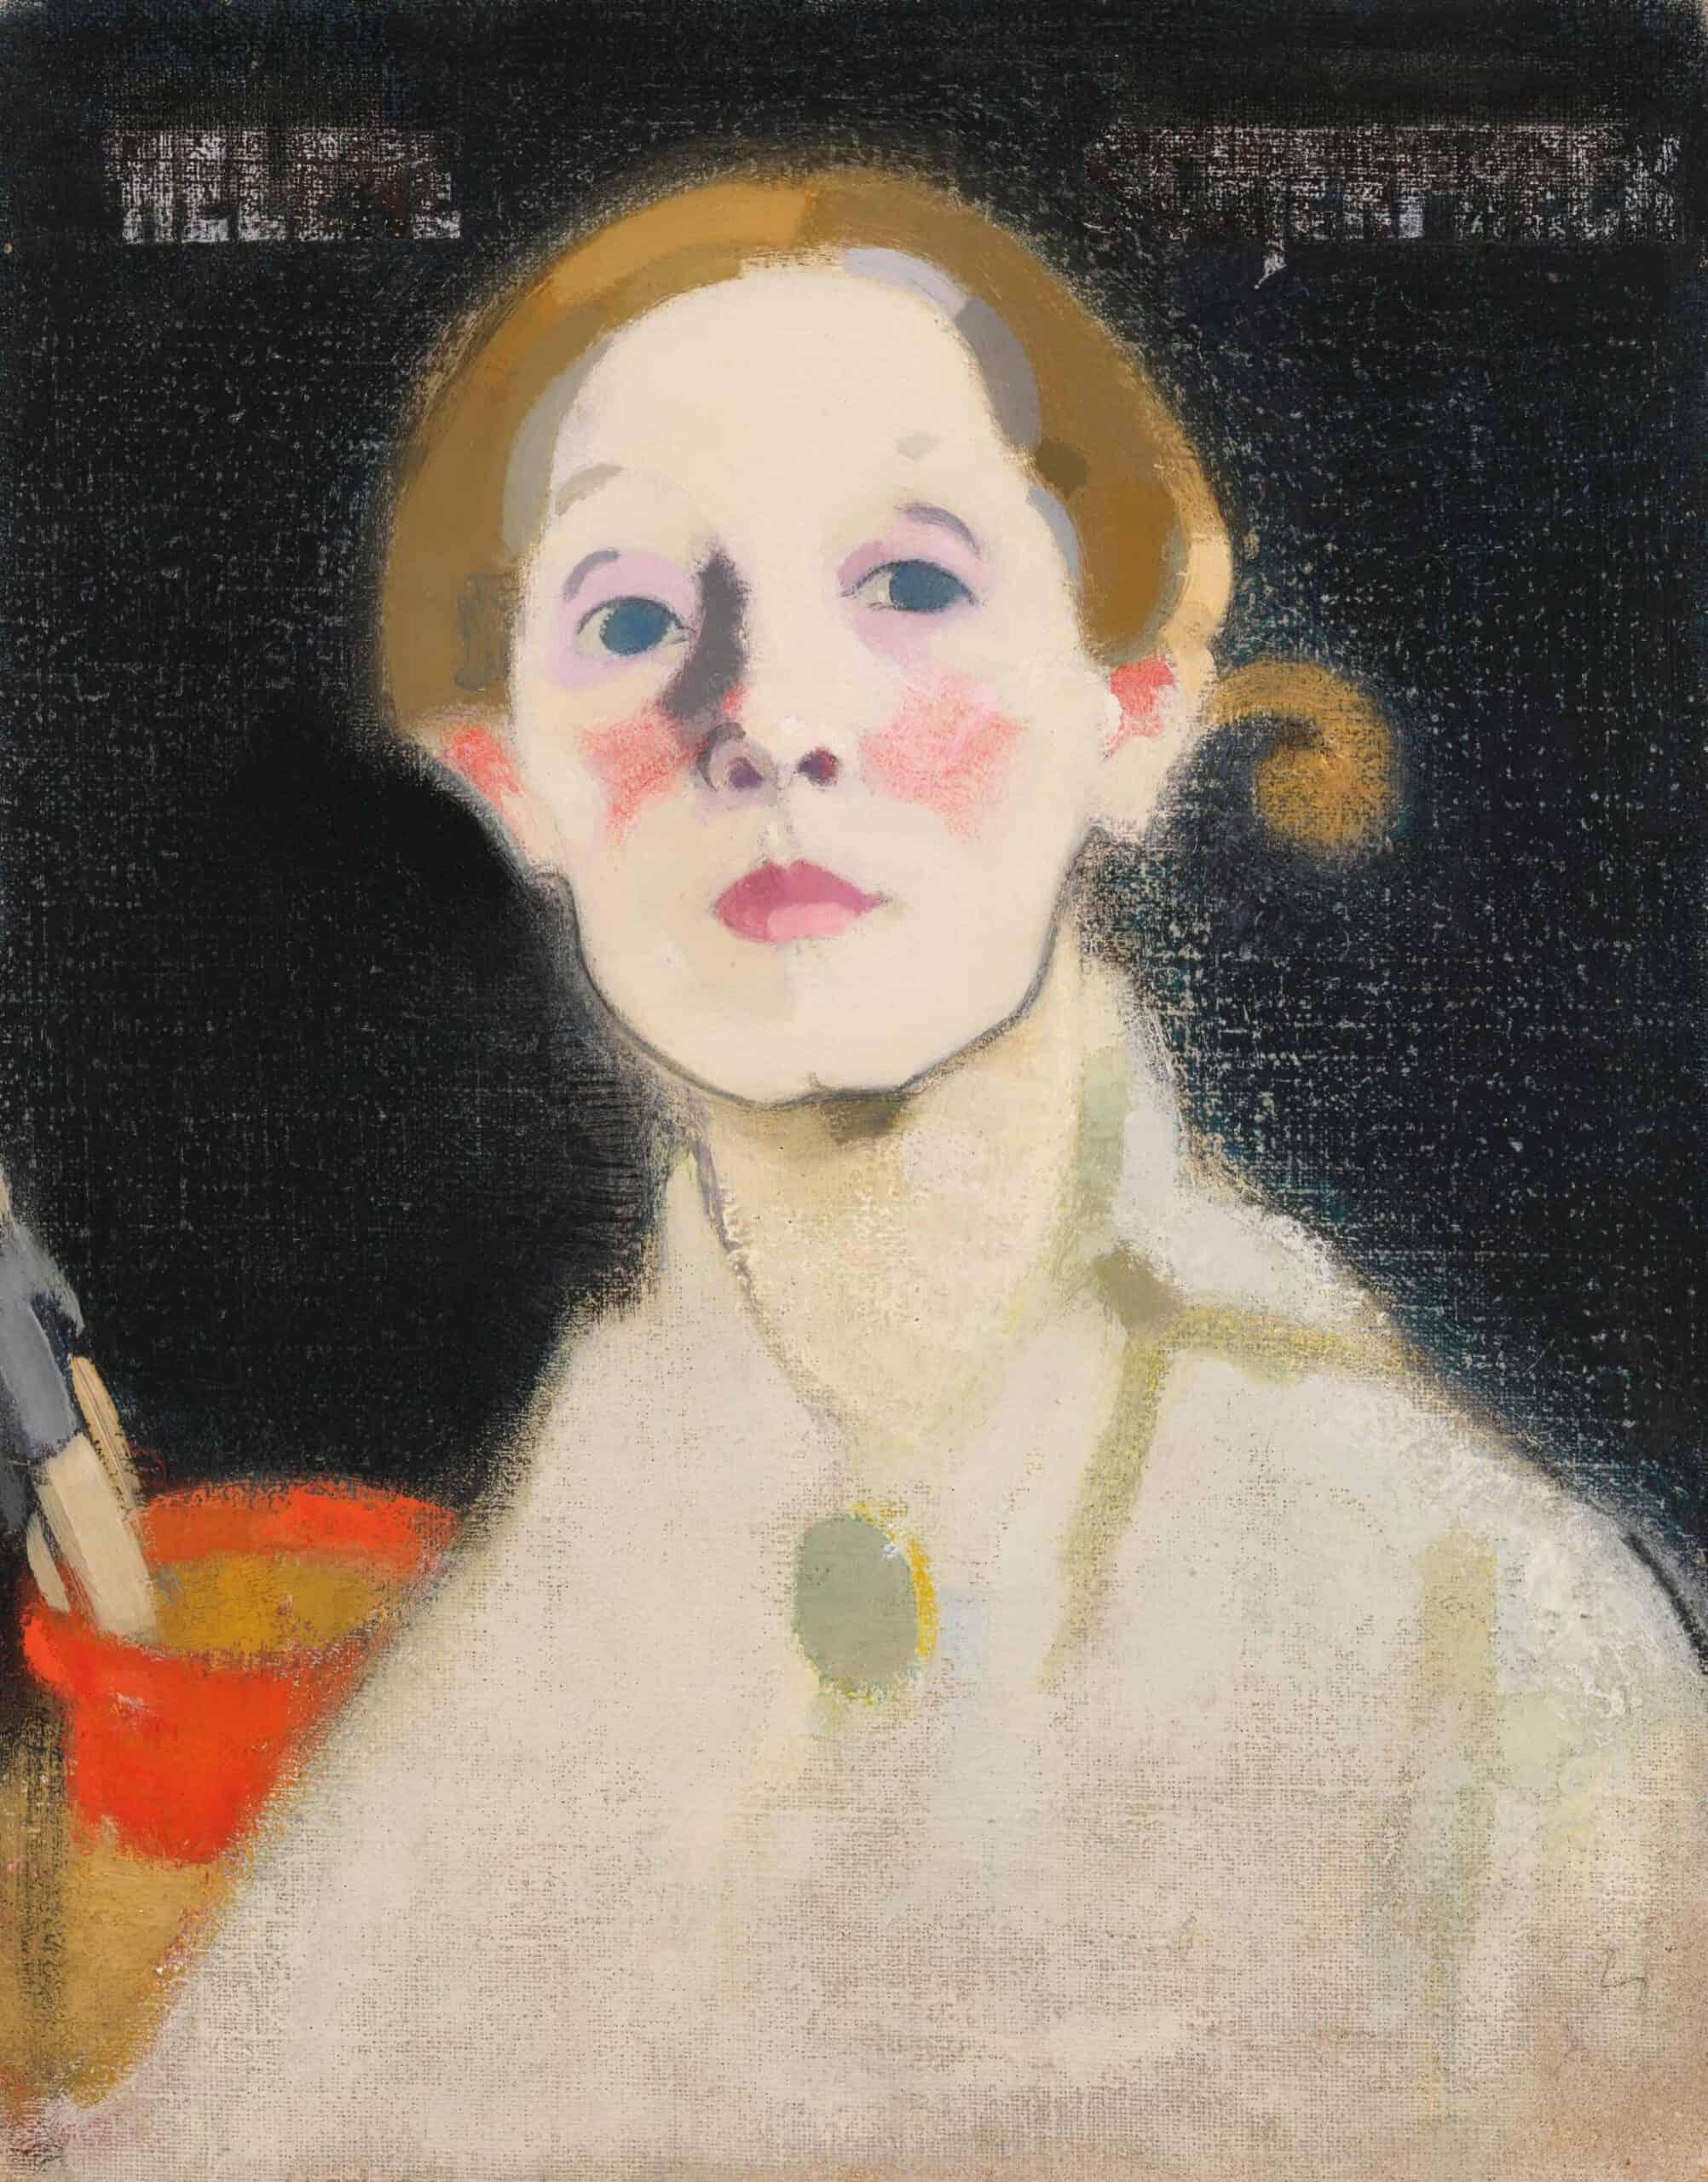 Helene Schjerfbeck - Self-portrait, Black Background, 1915. Photograph: Royal Academy of Arts